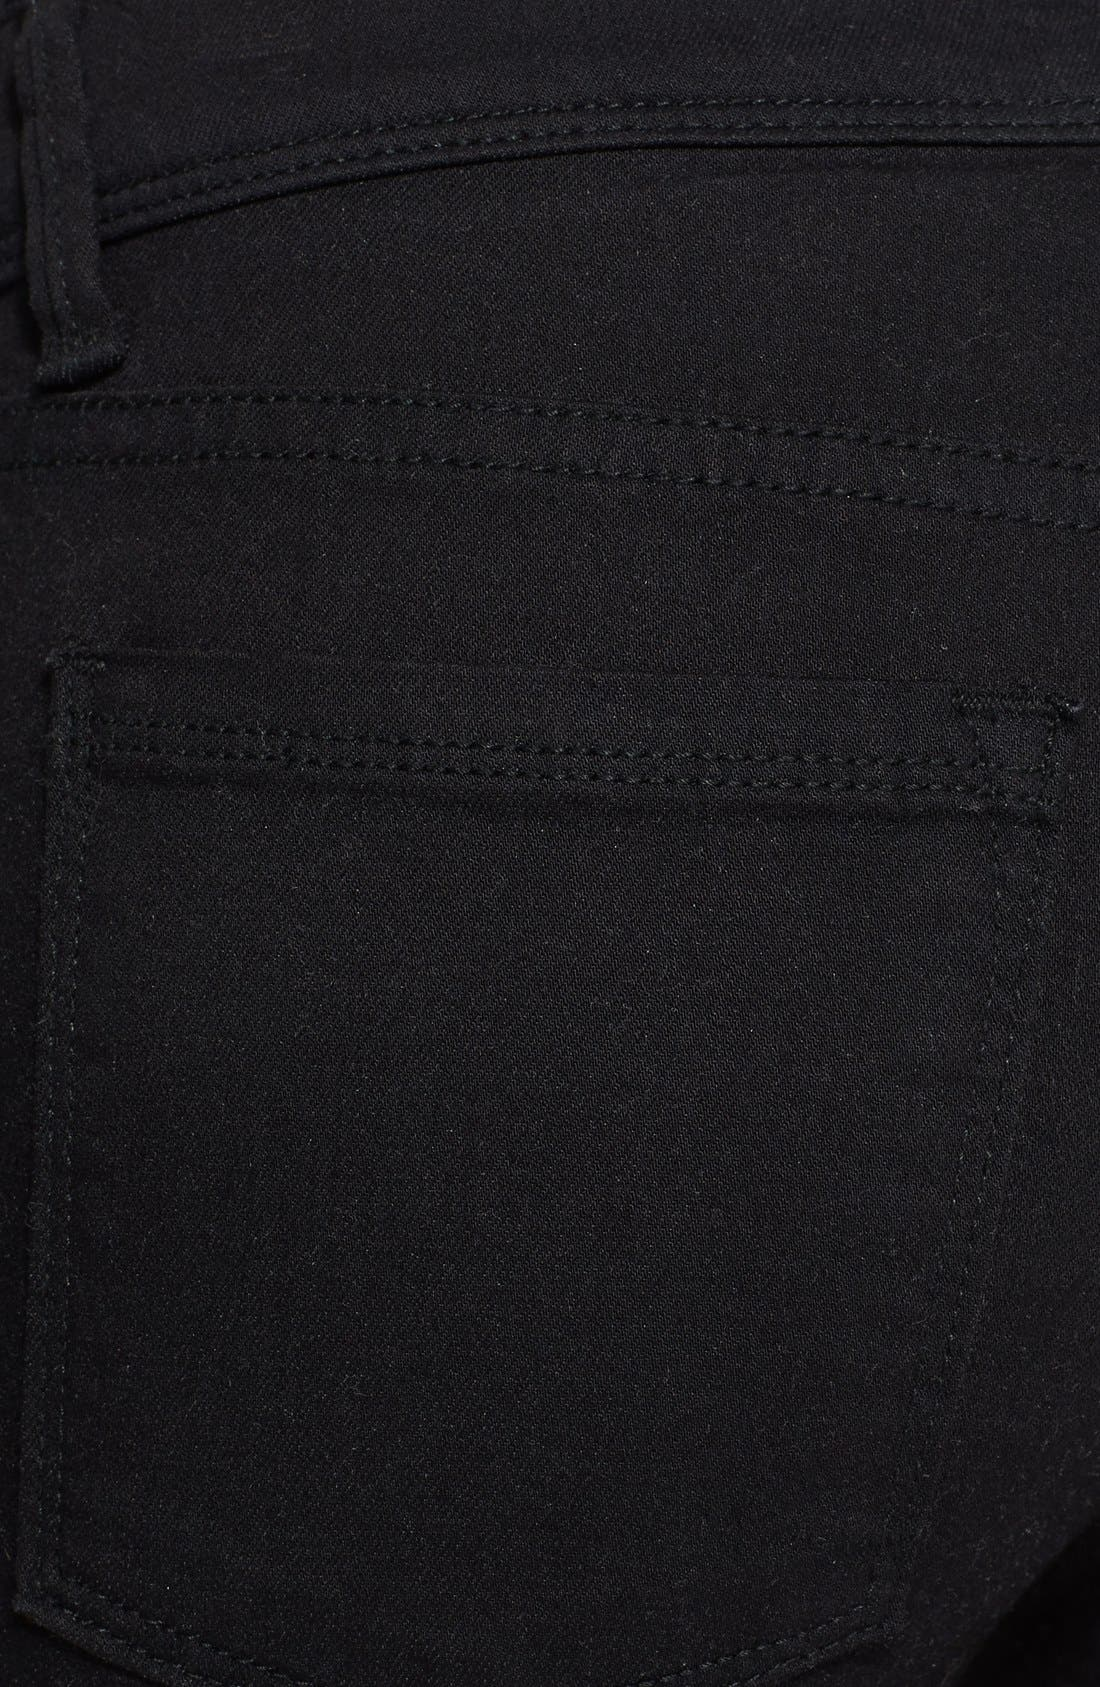 'Roller' Crop Skinny Jeans,                             Alternate thumbnail 2, color,                             001